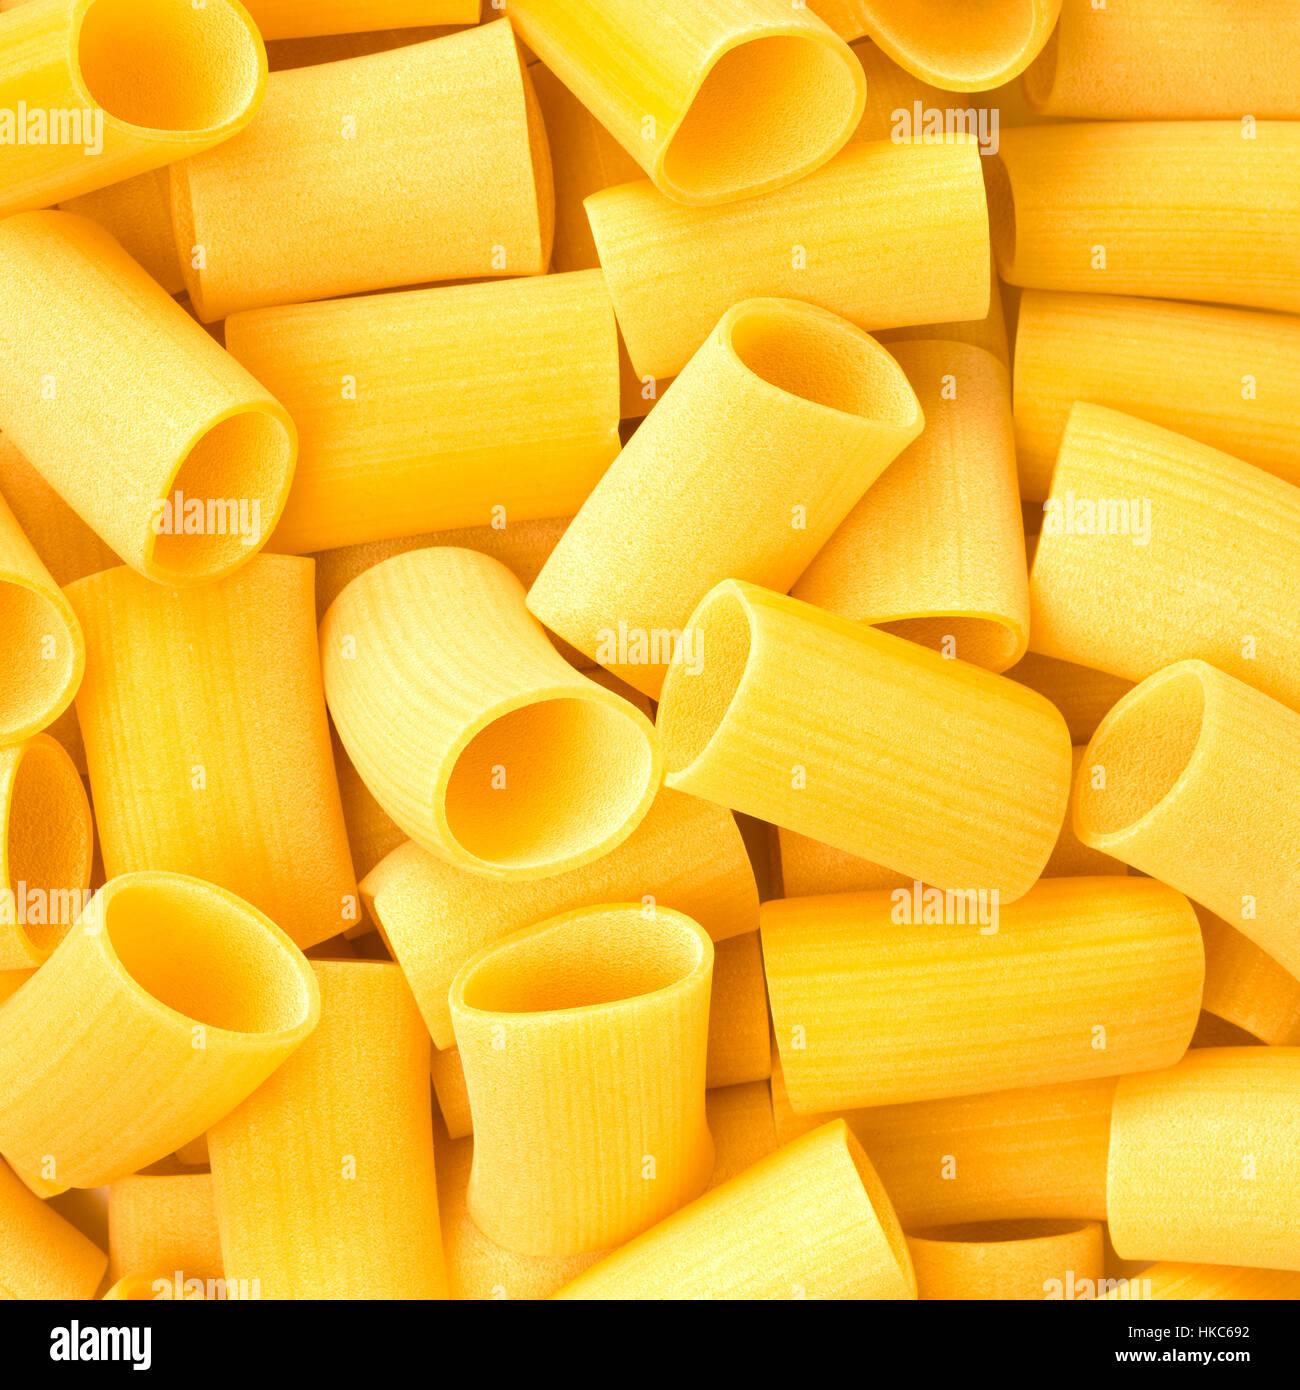 Italian Paccheri Macaroni Pasta raw food background or texture close up - Stock Image